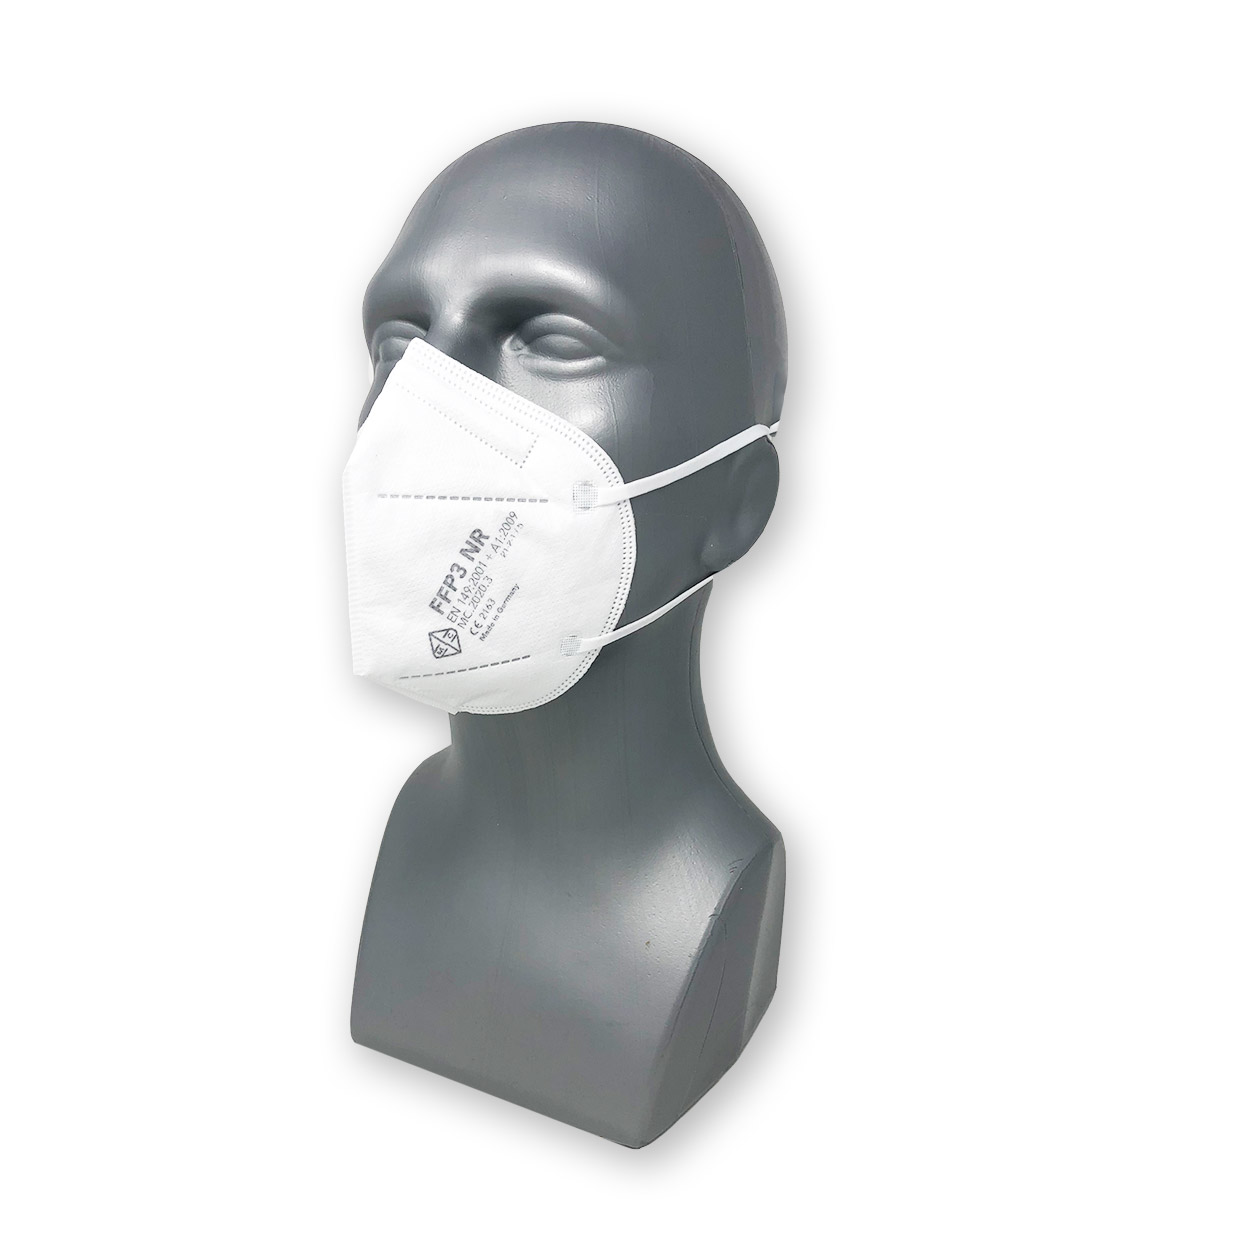 FFP3 Atemschutzmaske NR ohne Ventil - Packung á 6 Stück